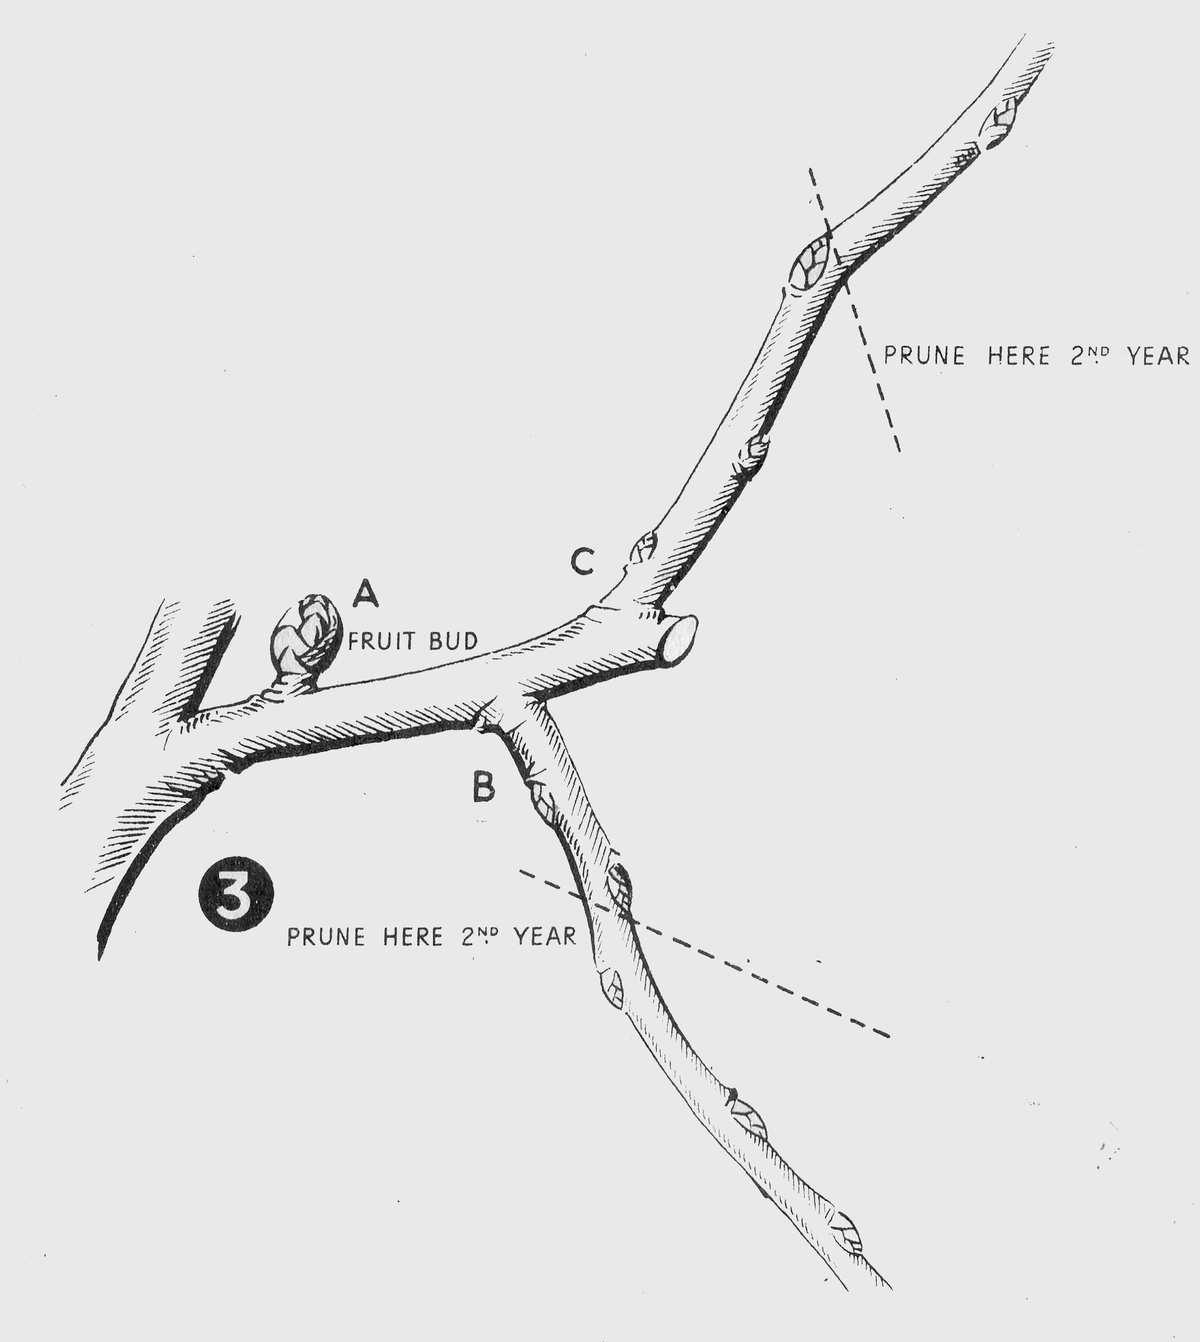 how to prune an apple tree diagram western salt spreader wiring pruning fruits plum damson cherry pear